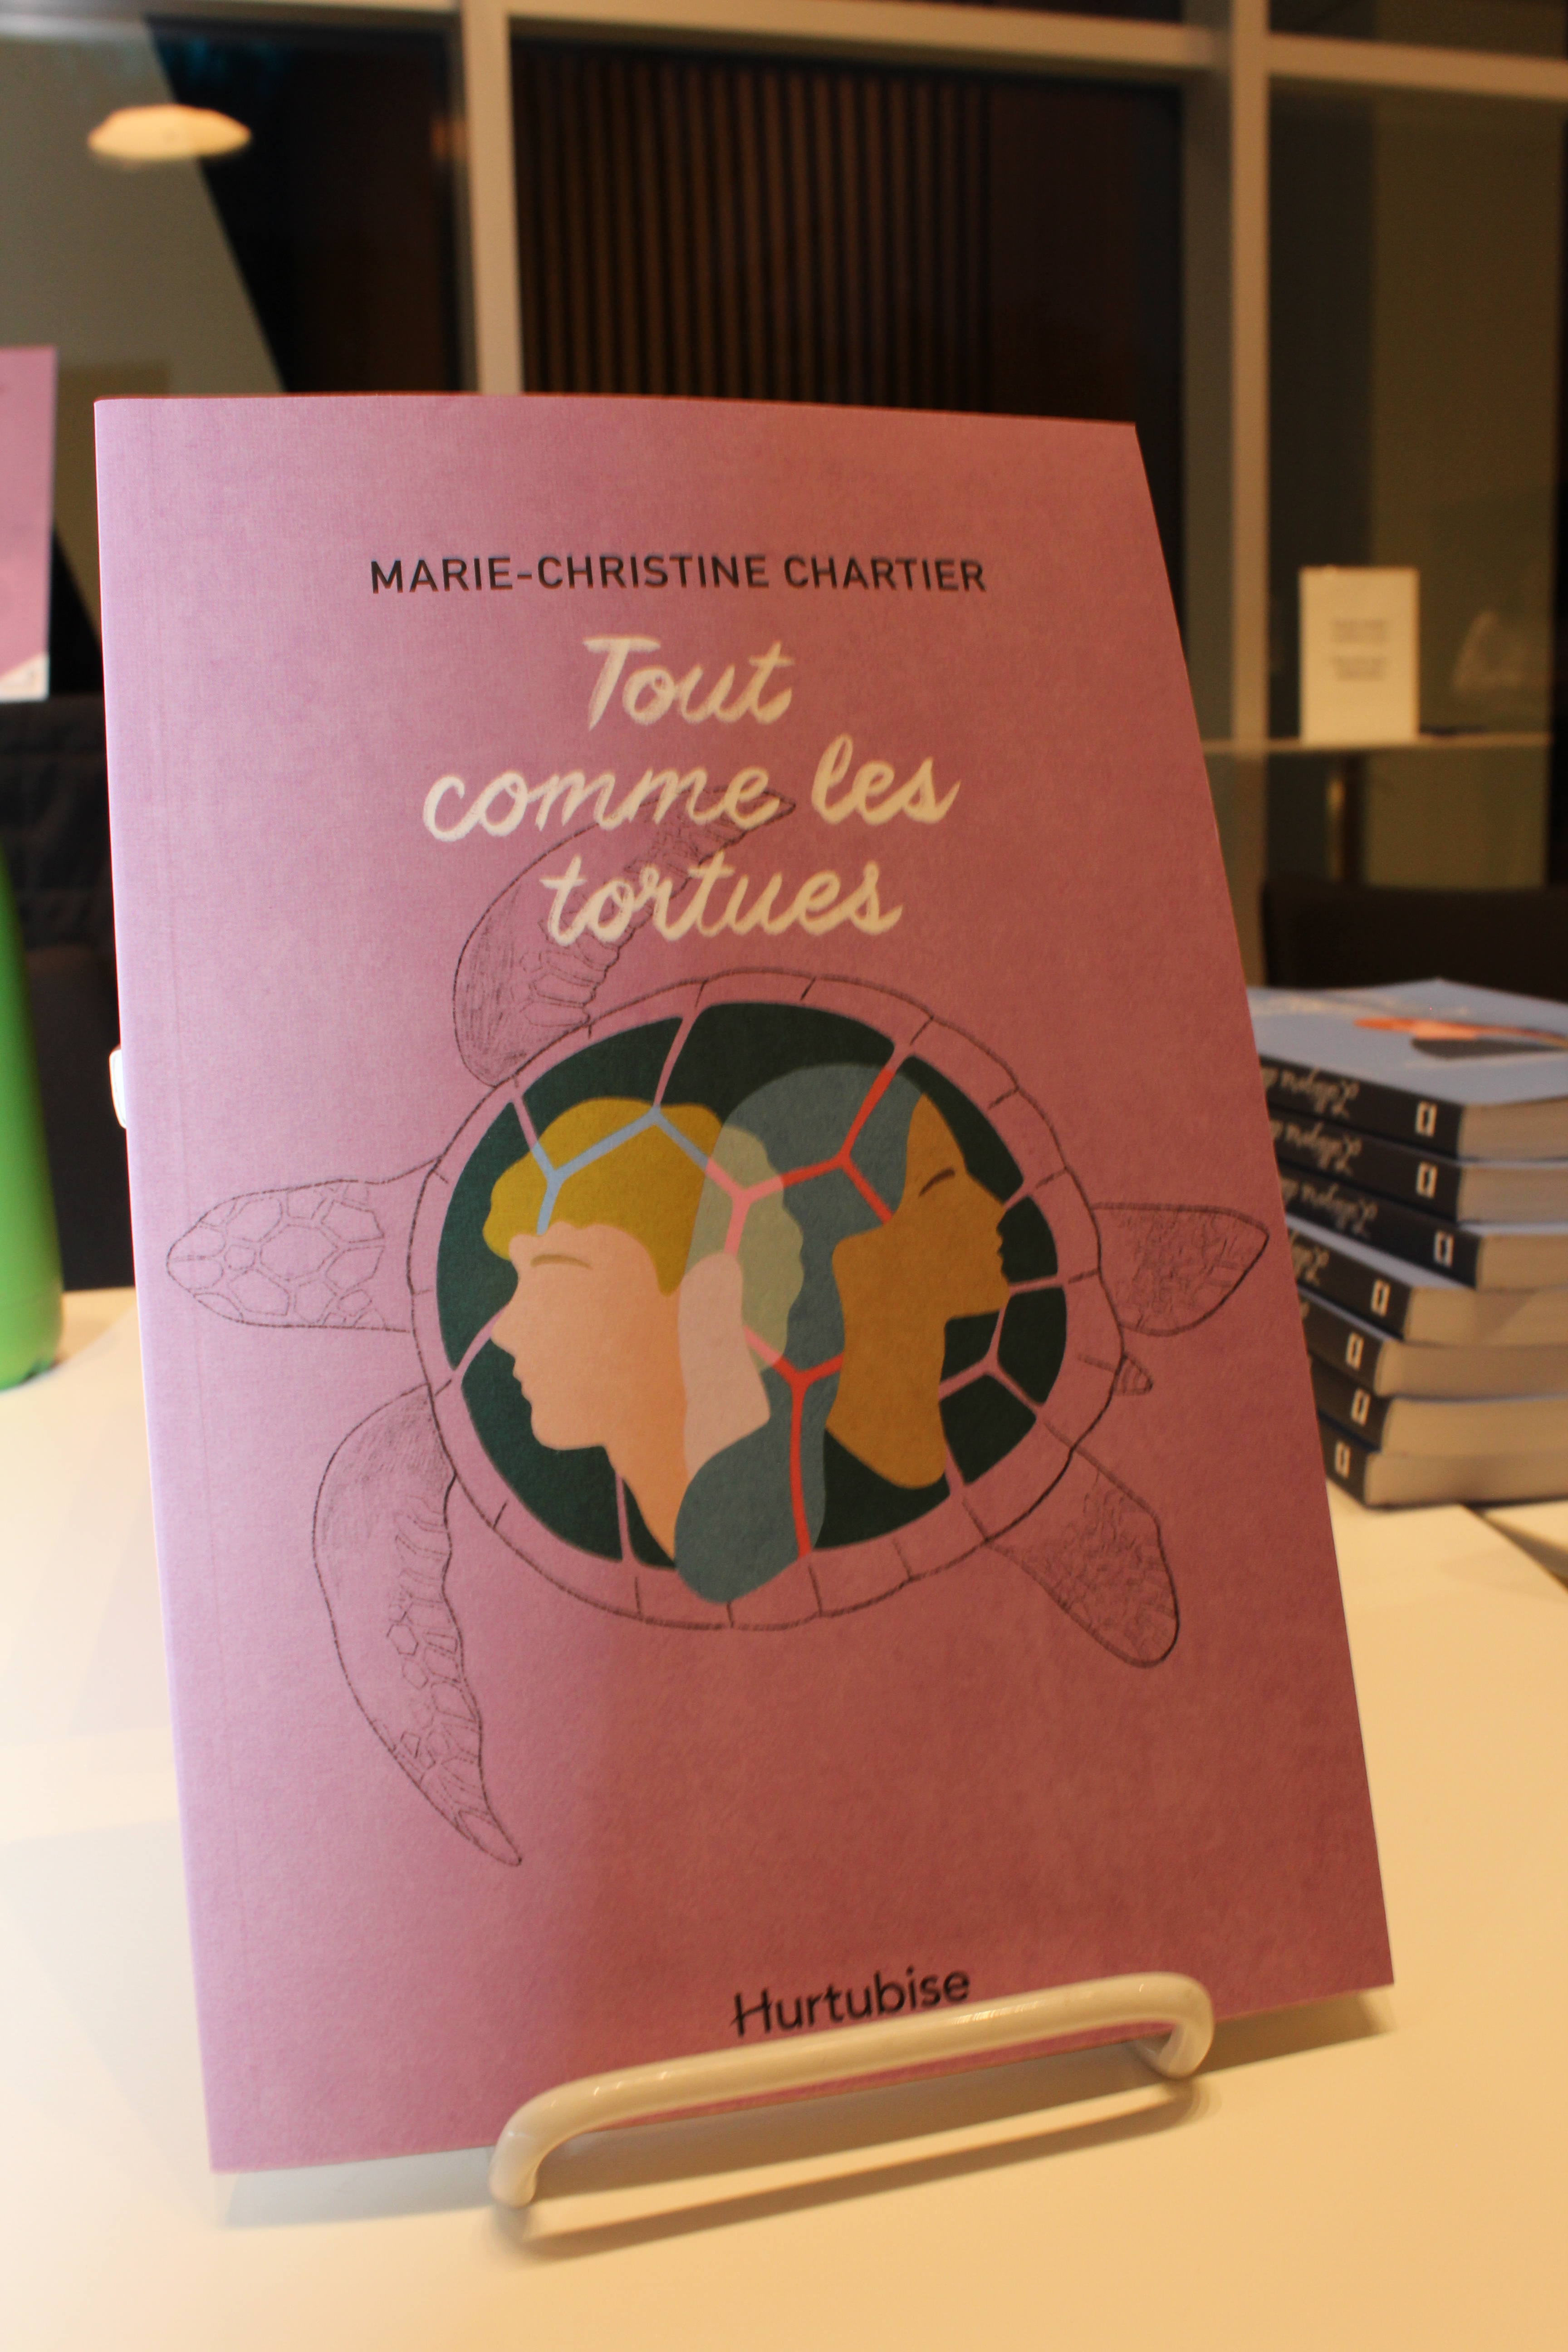 Marie-Christine Chartier